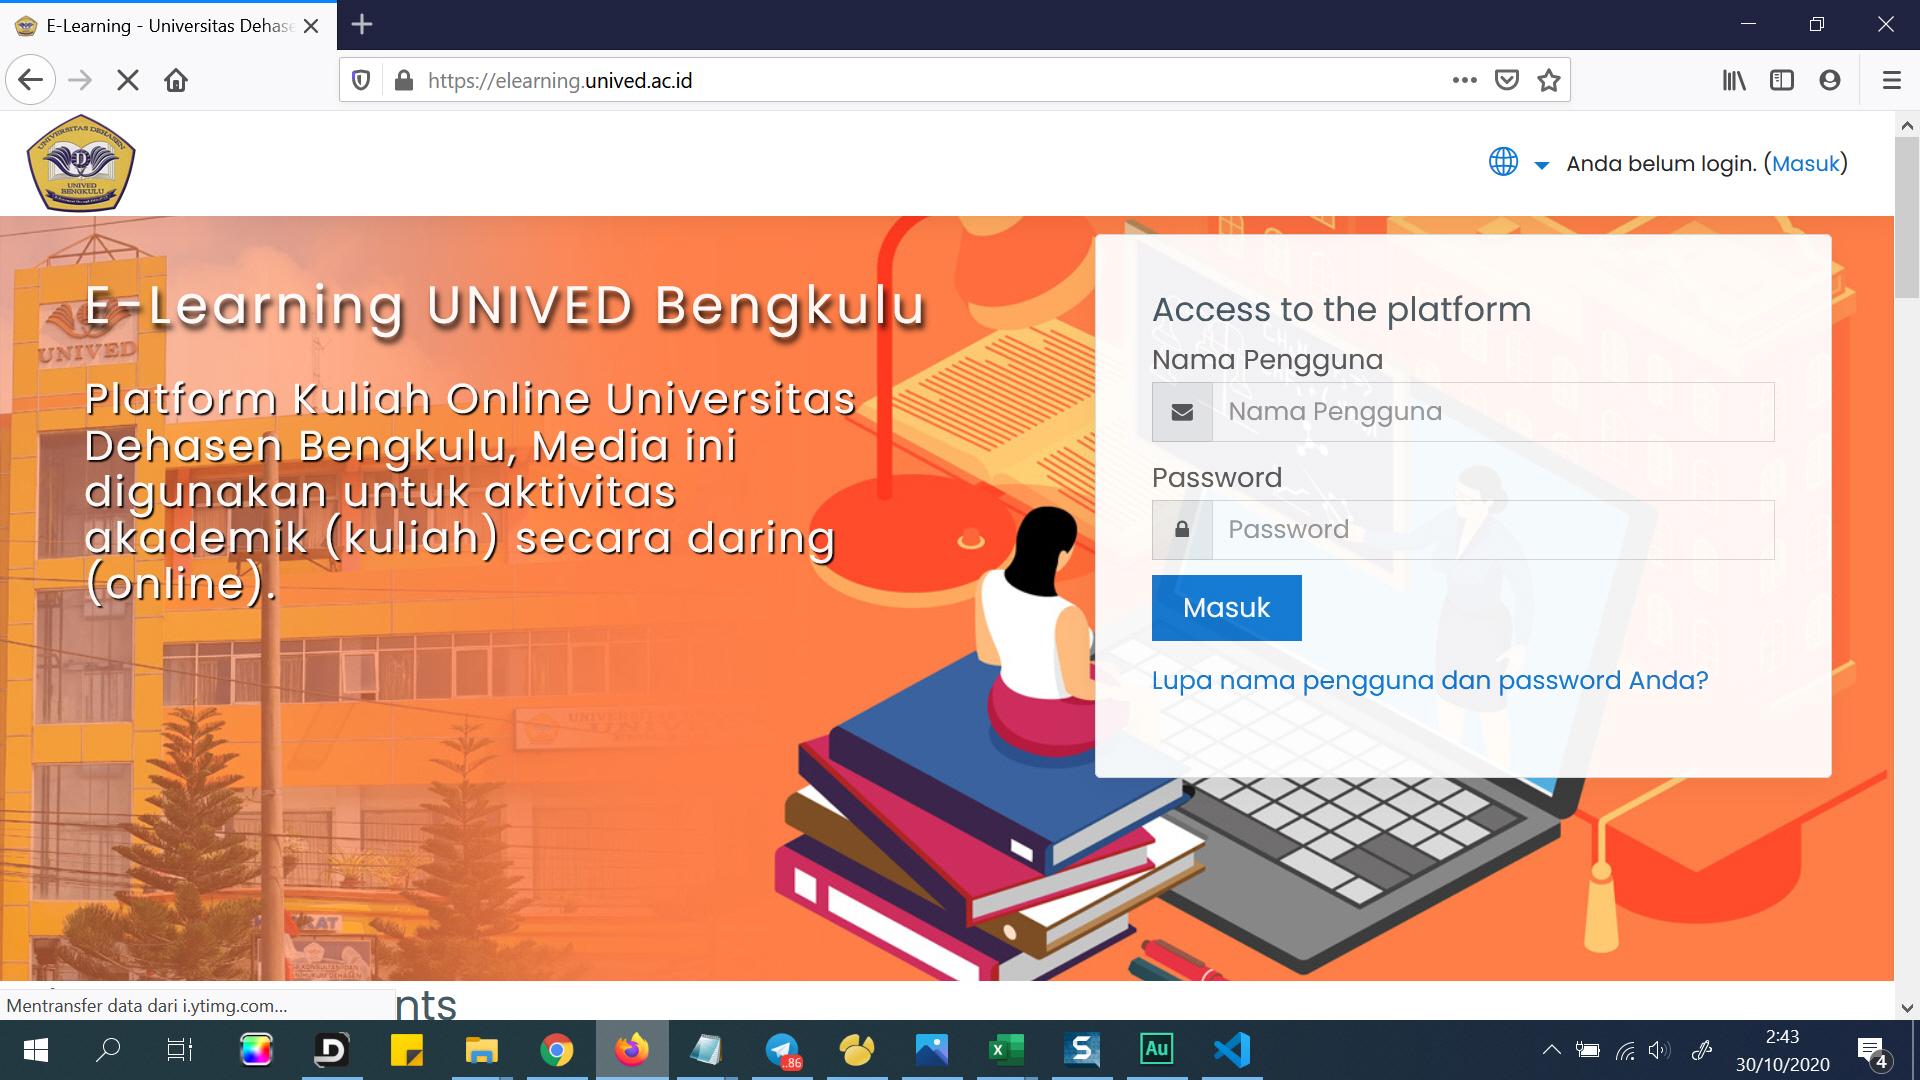 Elearning Universitas Dehasen Bengkulu